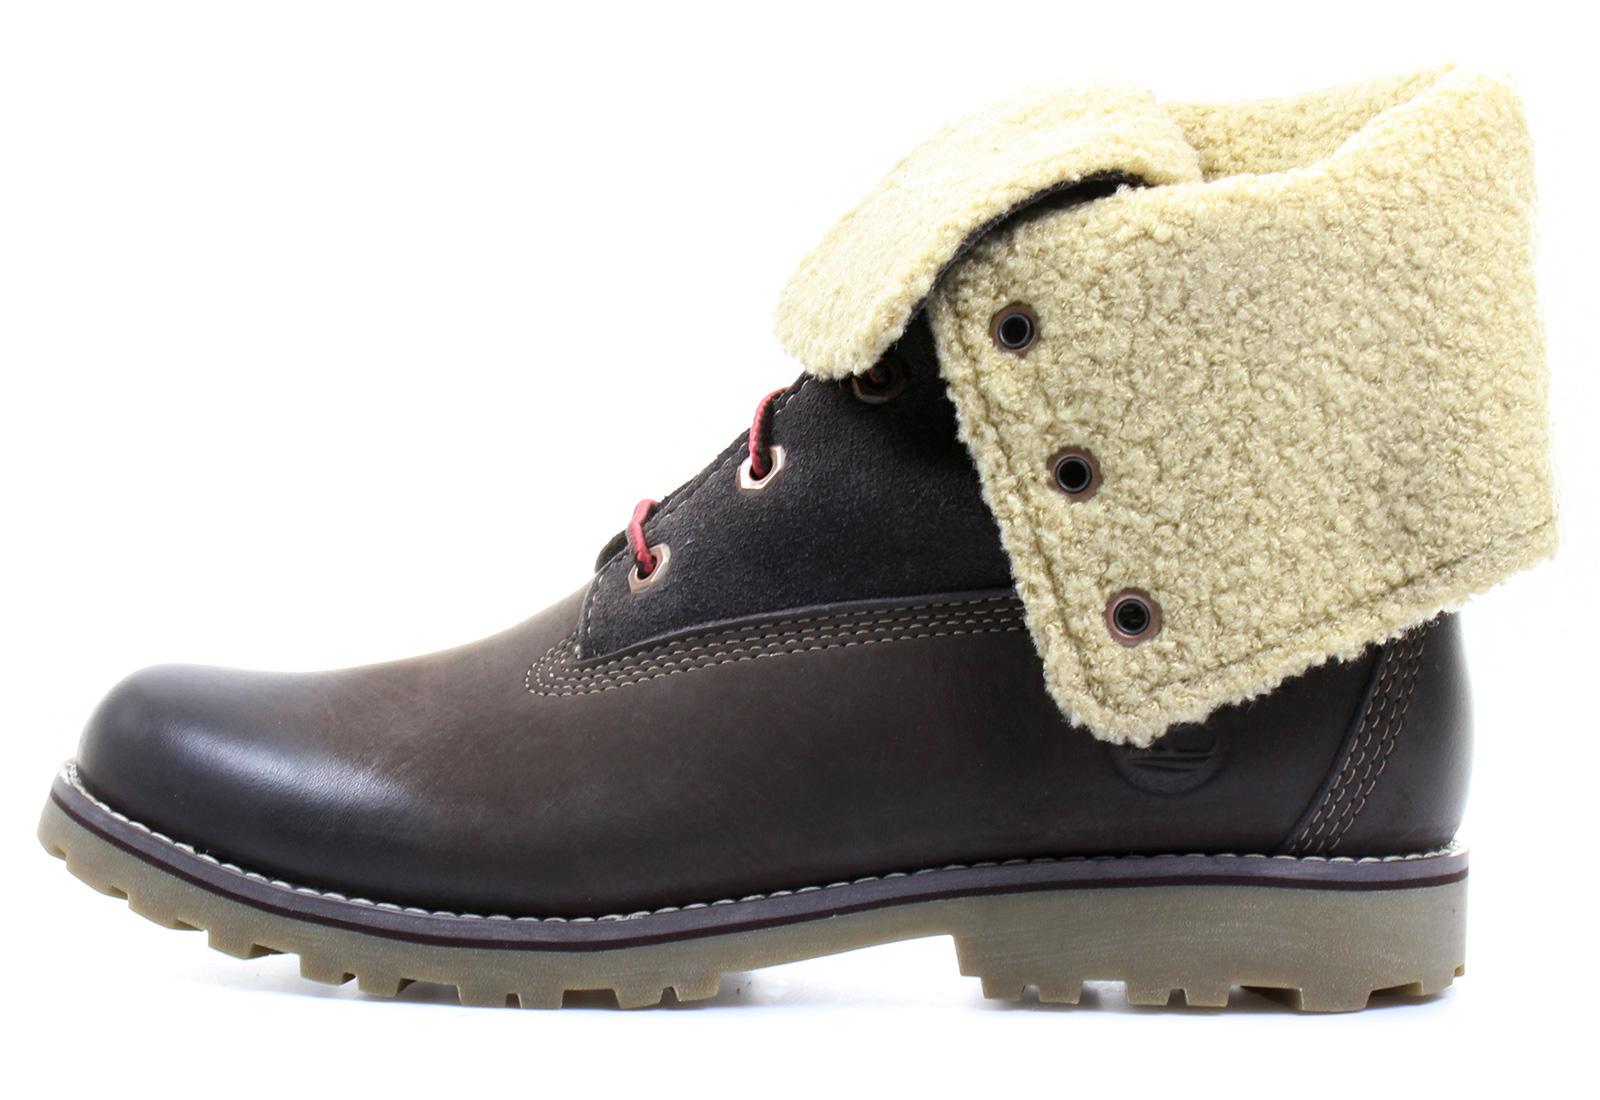 Timberland Bakancs - 6 Inch Shearling Boot - 6298R-DBR - Office Shoes  Magyarország Skechers Csizma - Boot High ... e492b2ca72